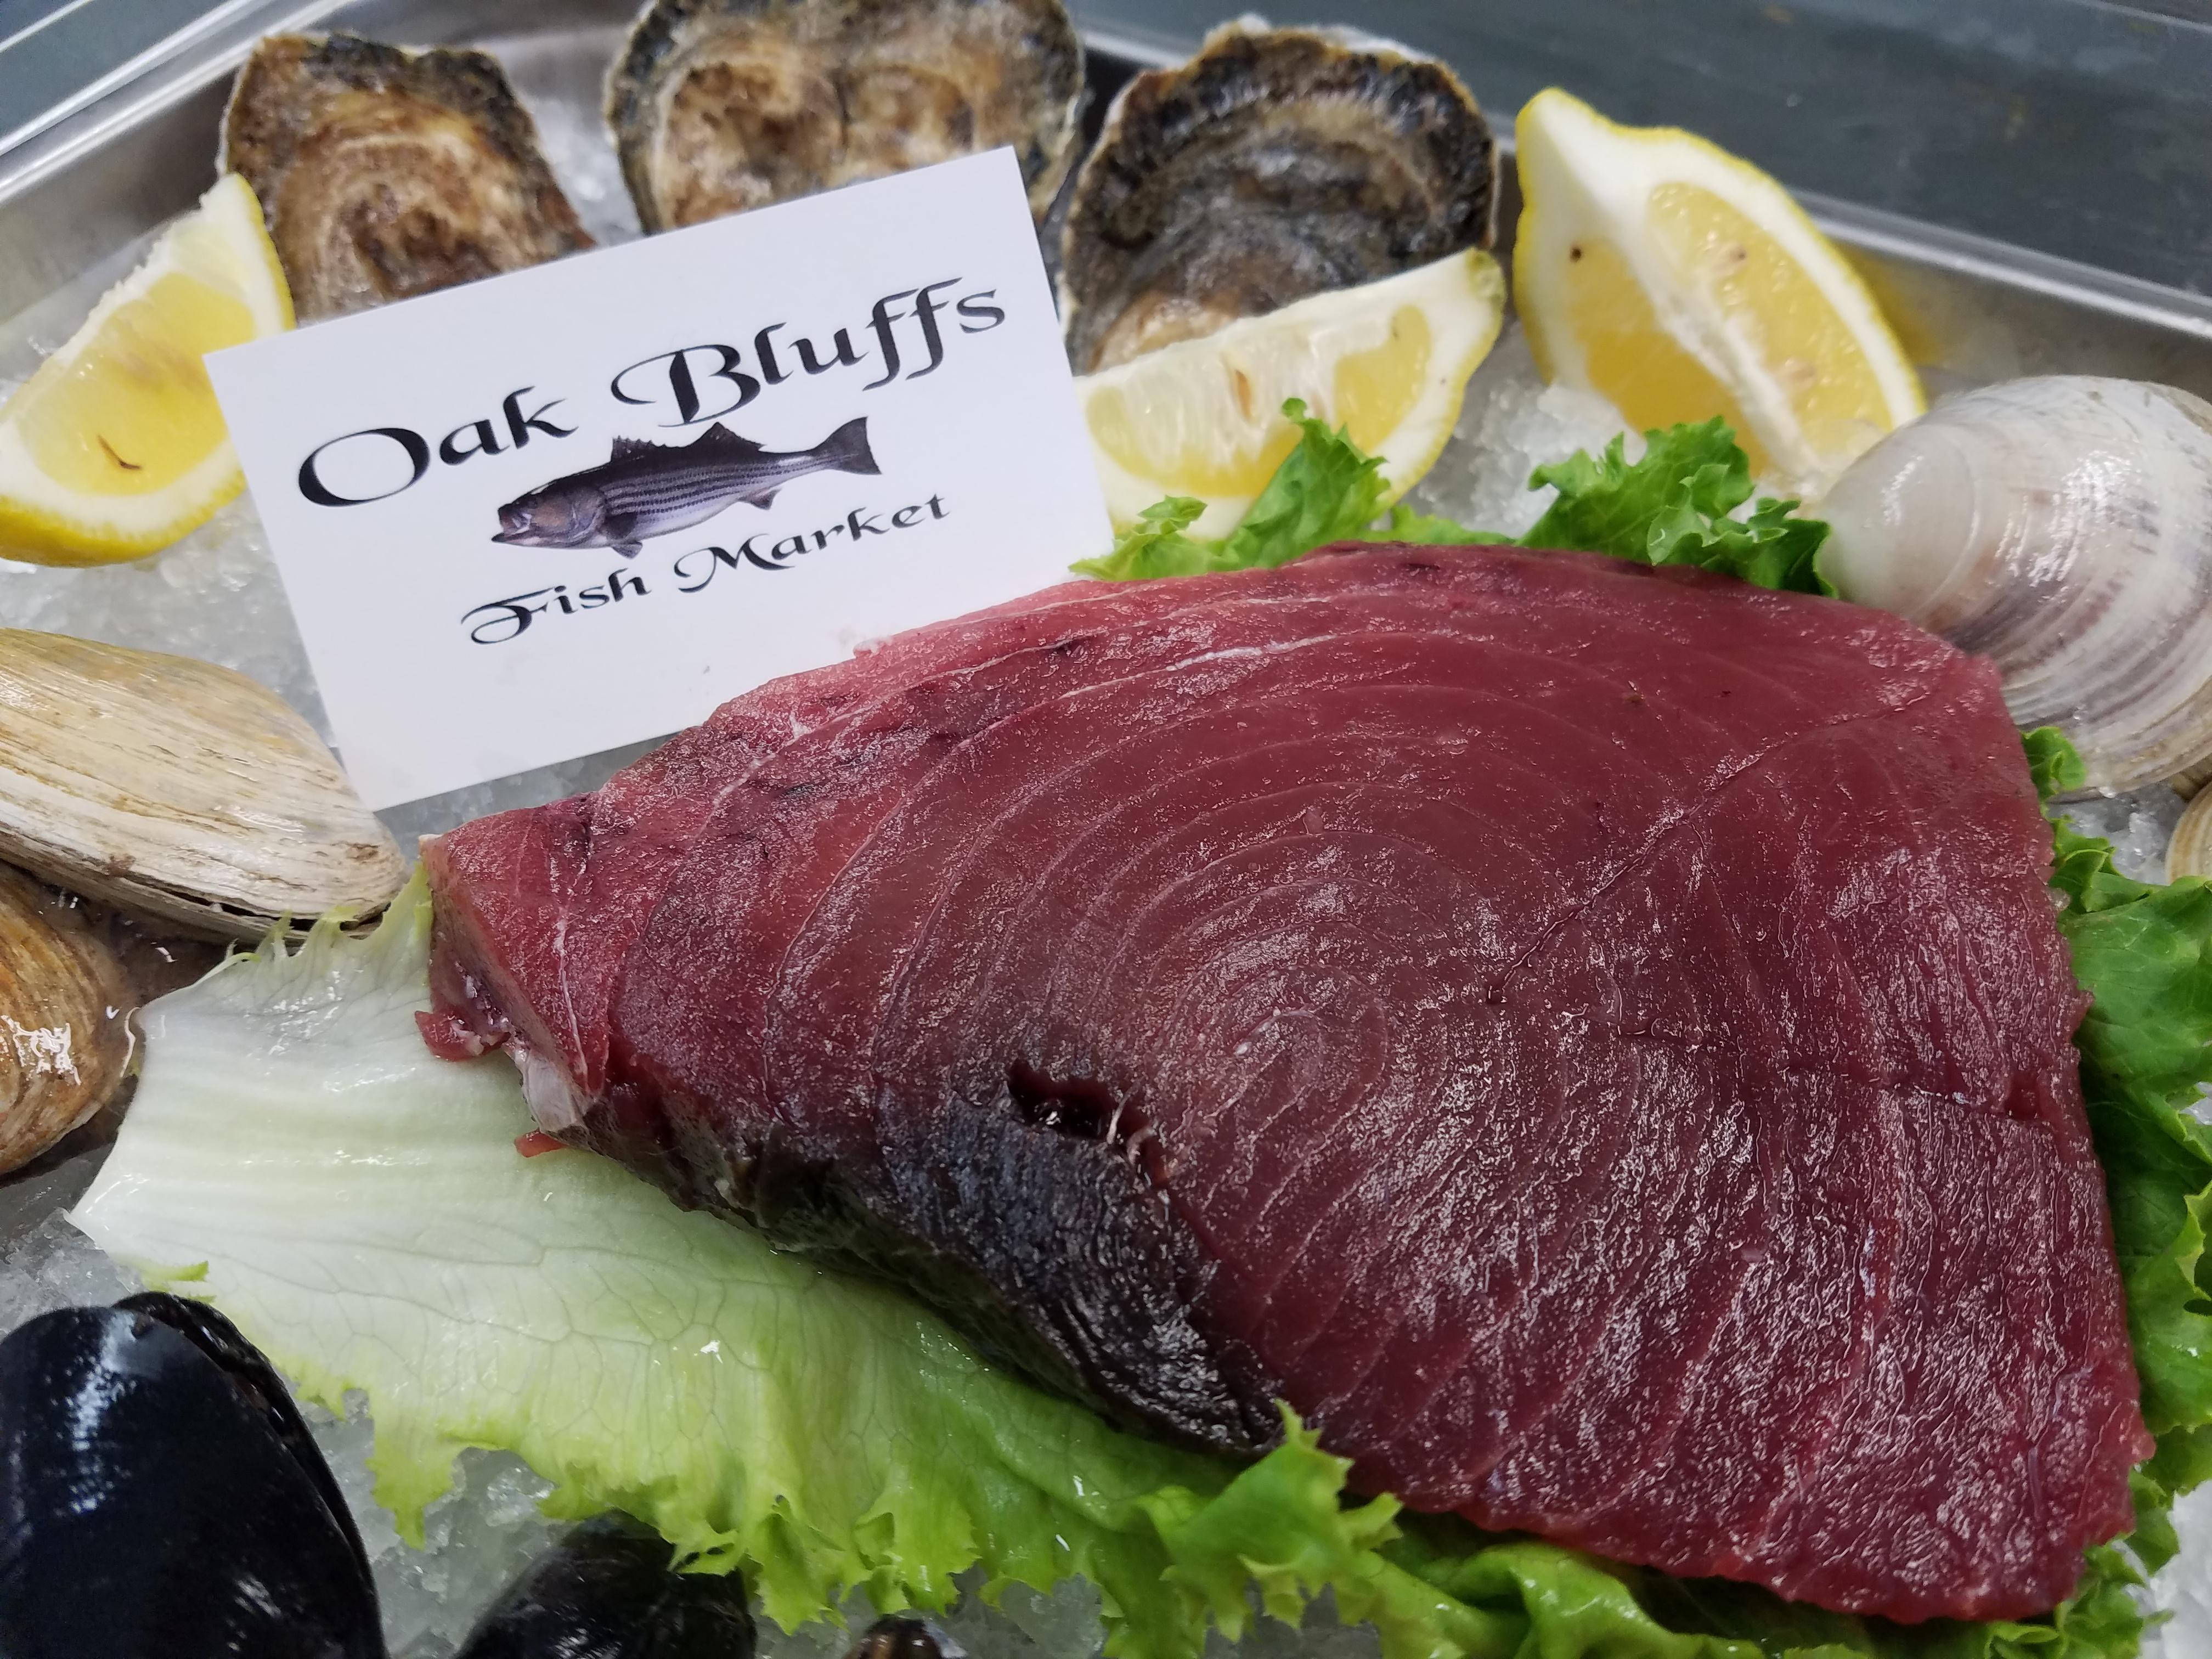 Fresh Local Fish Martha's Vineyard - Oak Bluffs Fish Market